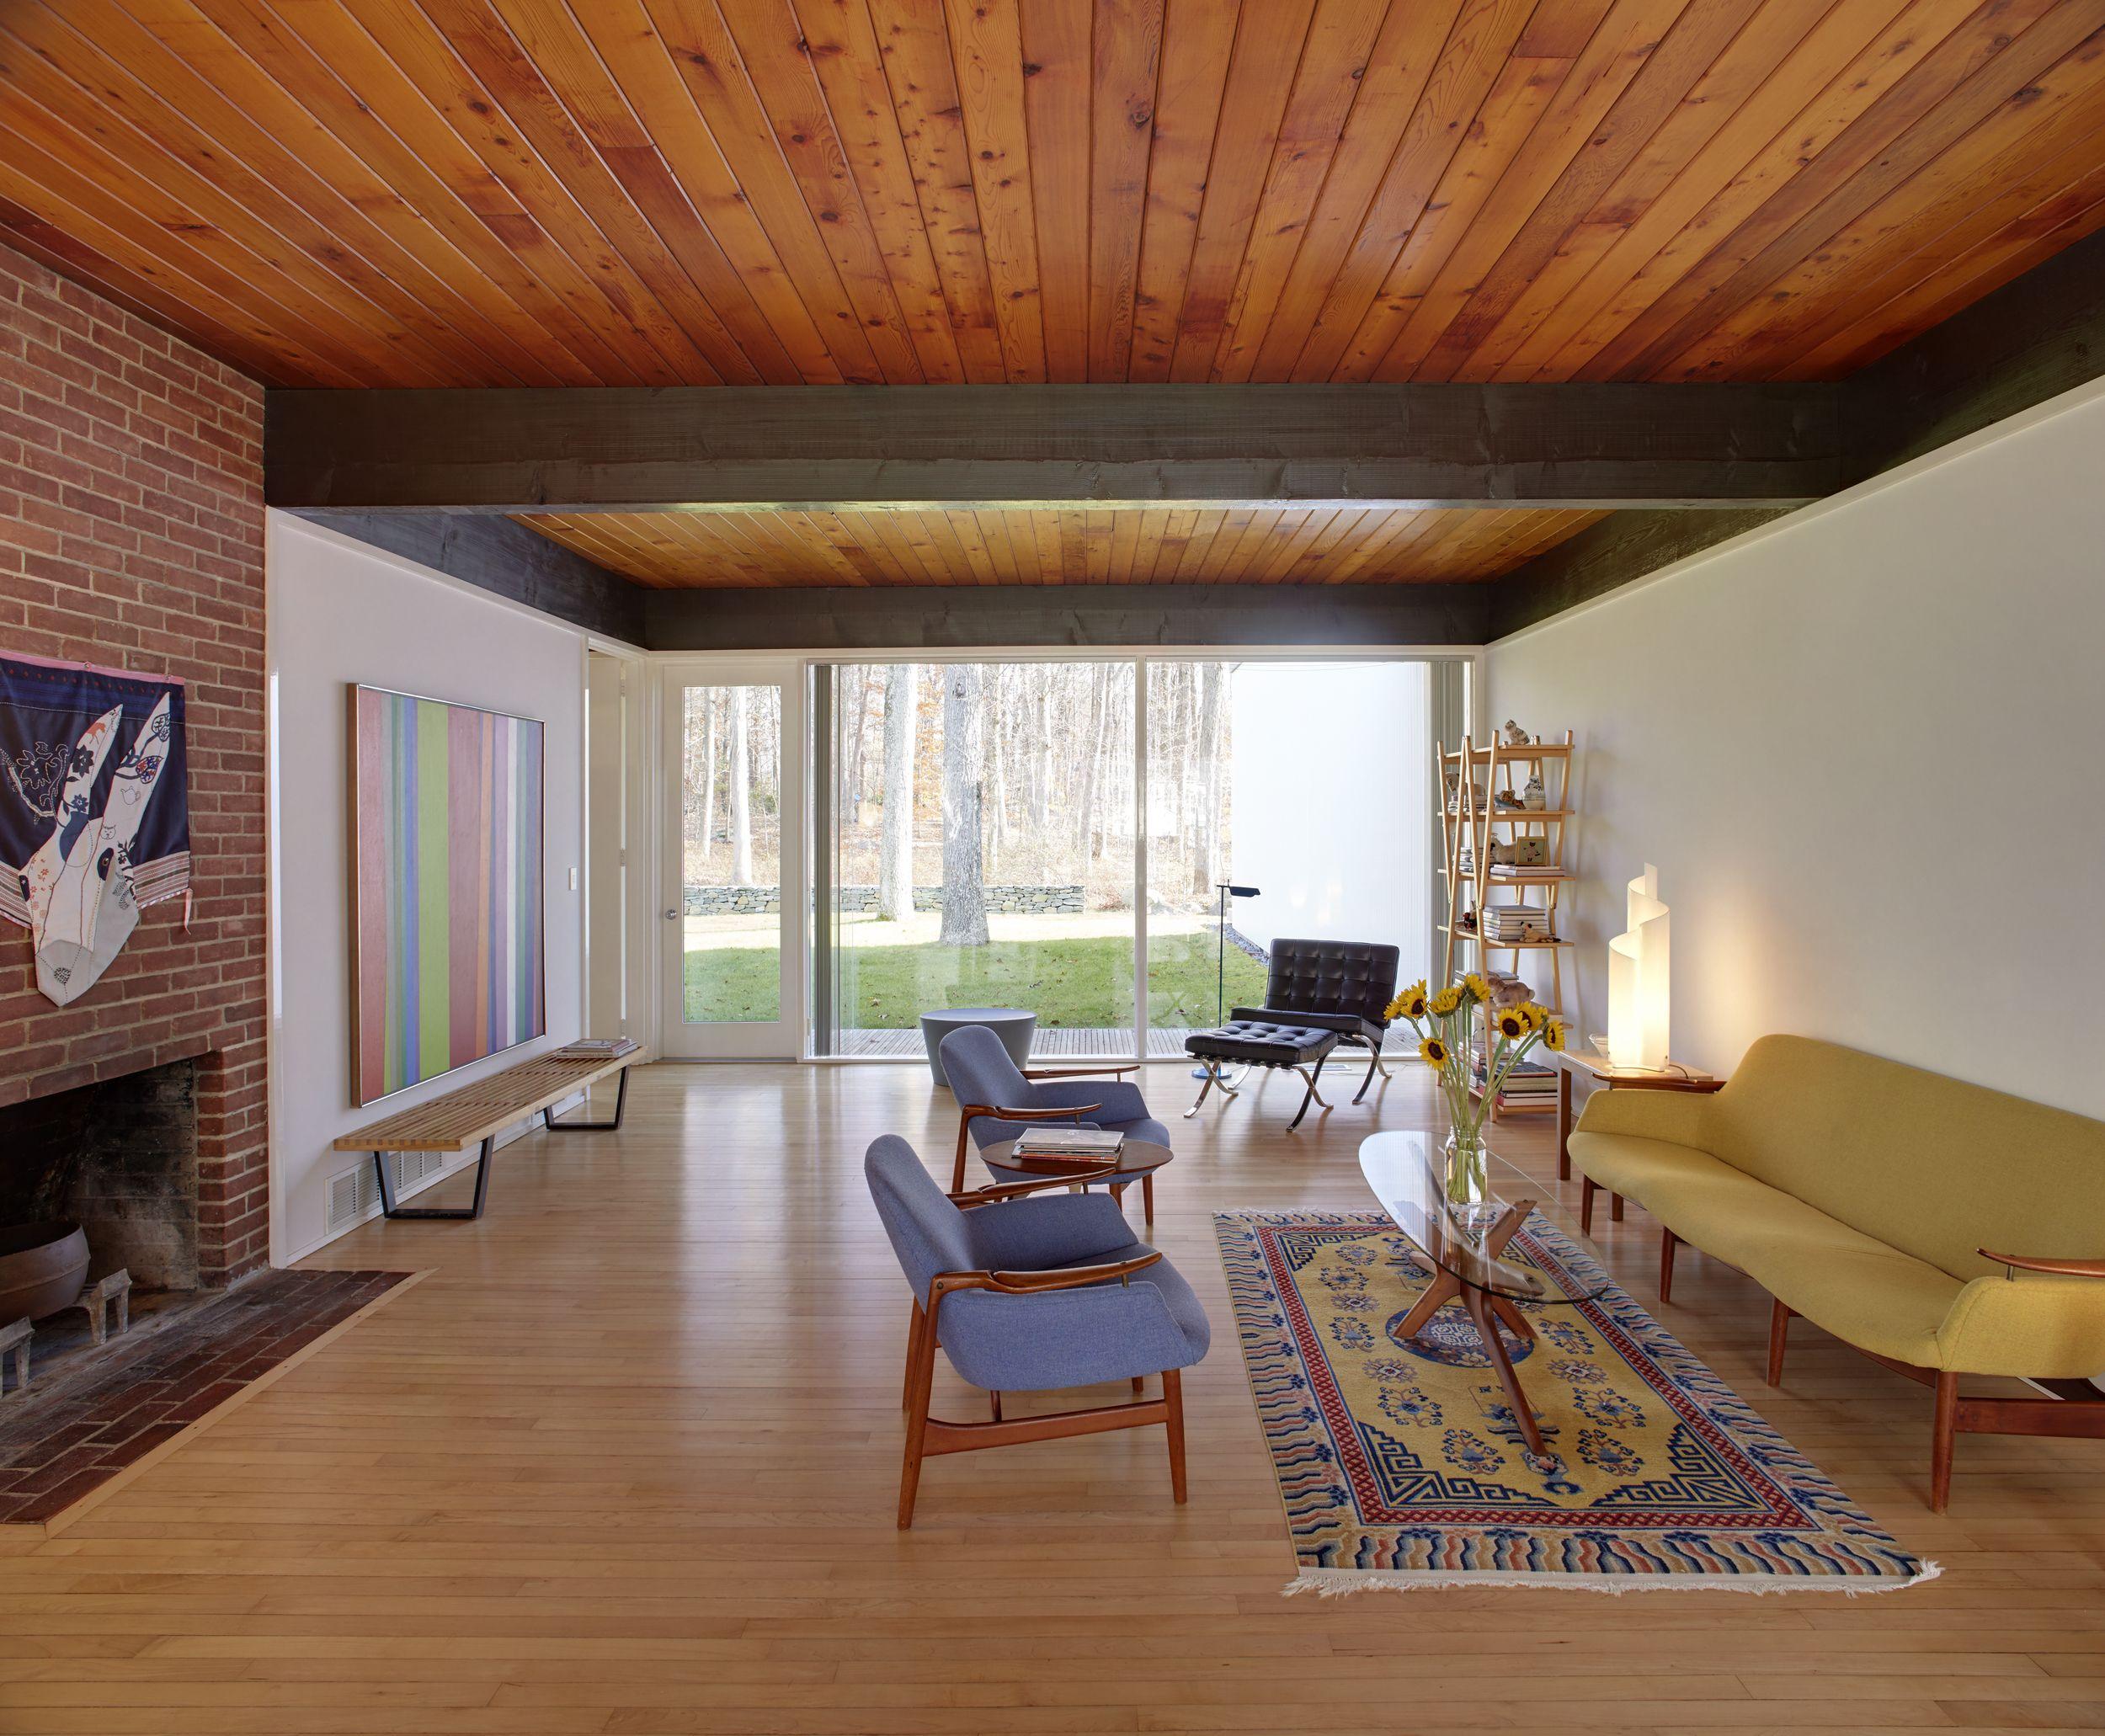 10 absolutely gorgeous midcentury living rooms interior design pinterest mid century. Black Bedroom Furniture Sets. Home Design Ideas